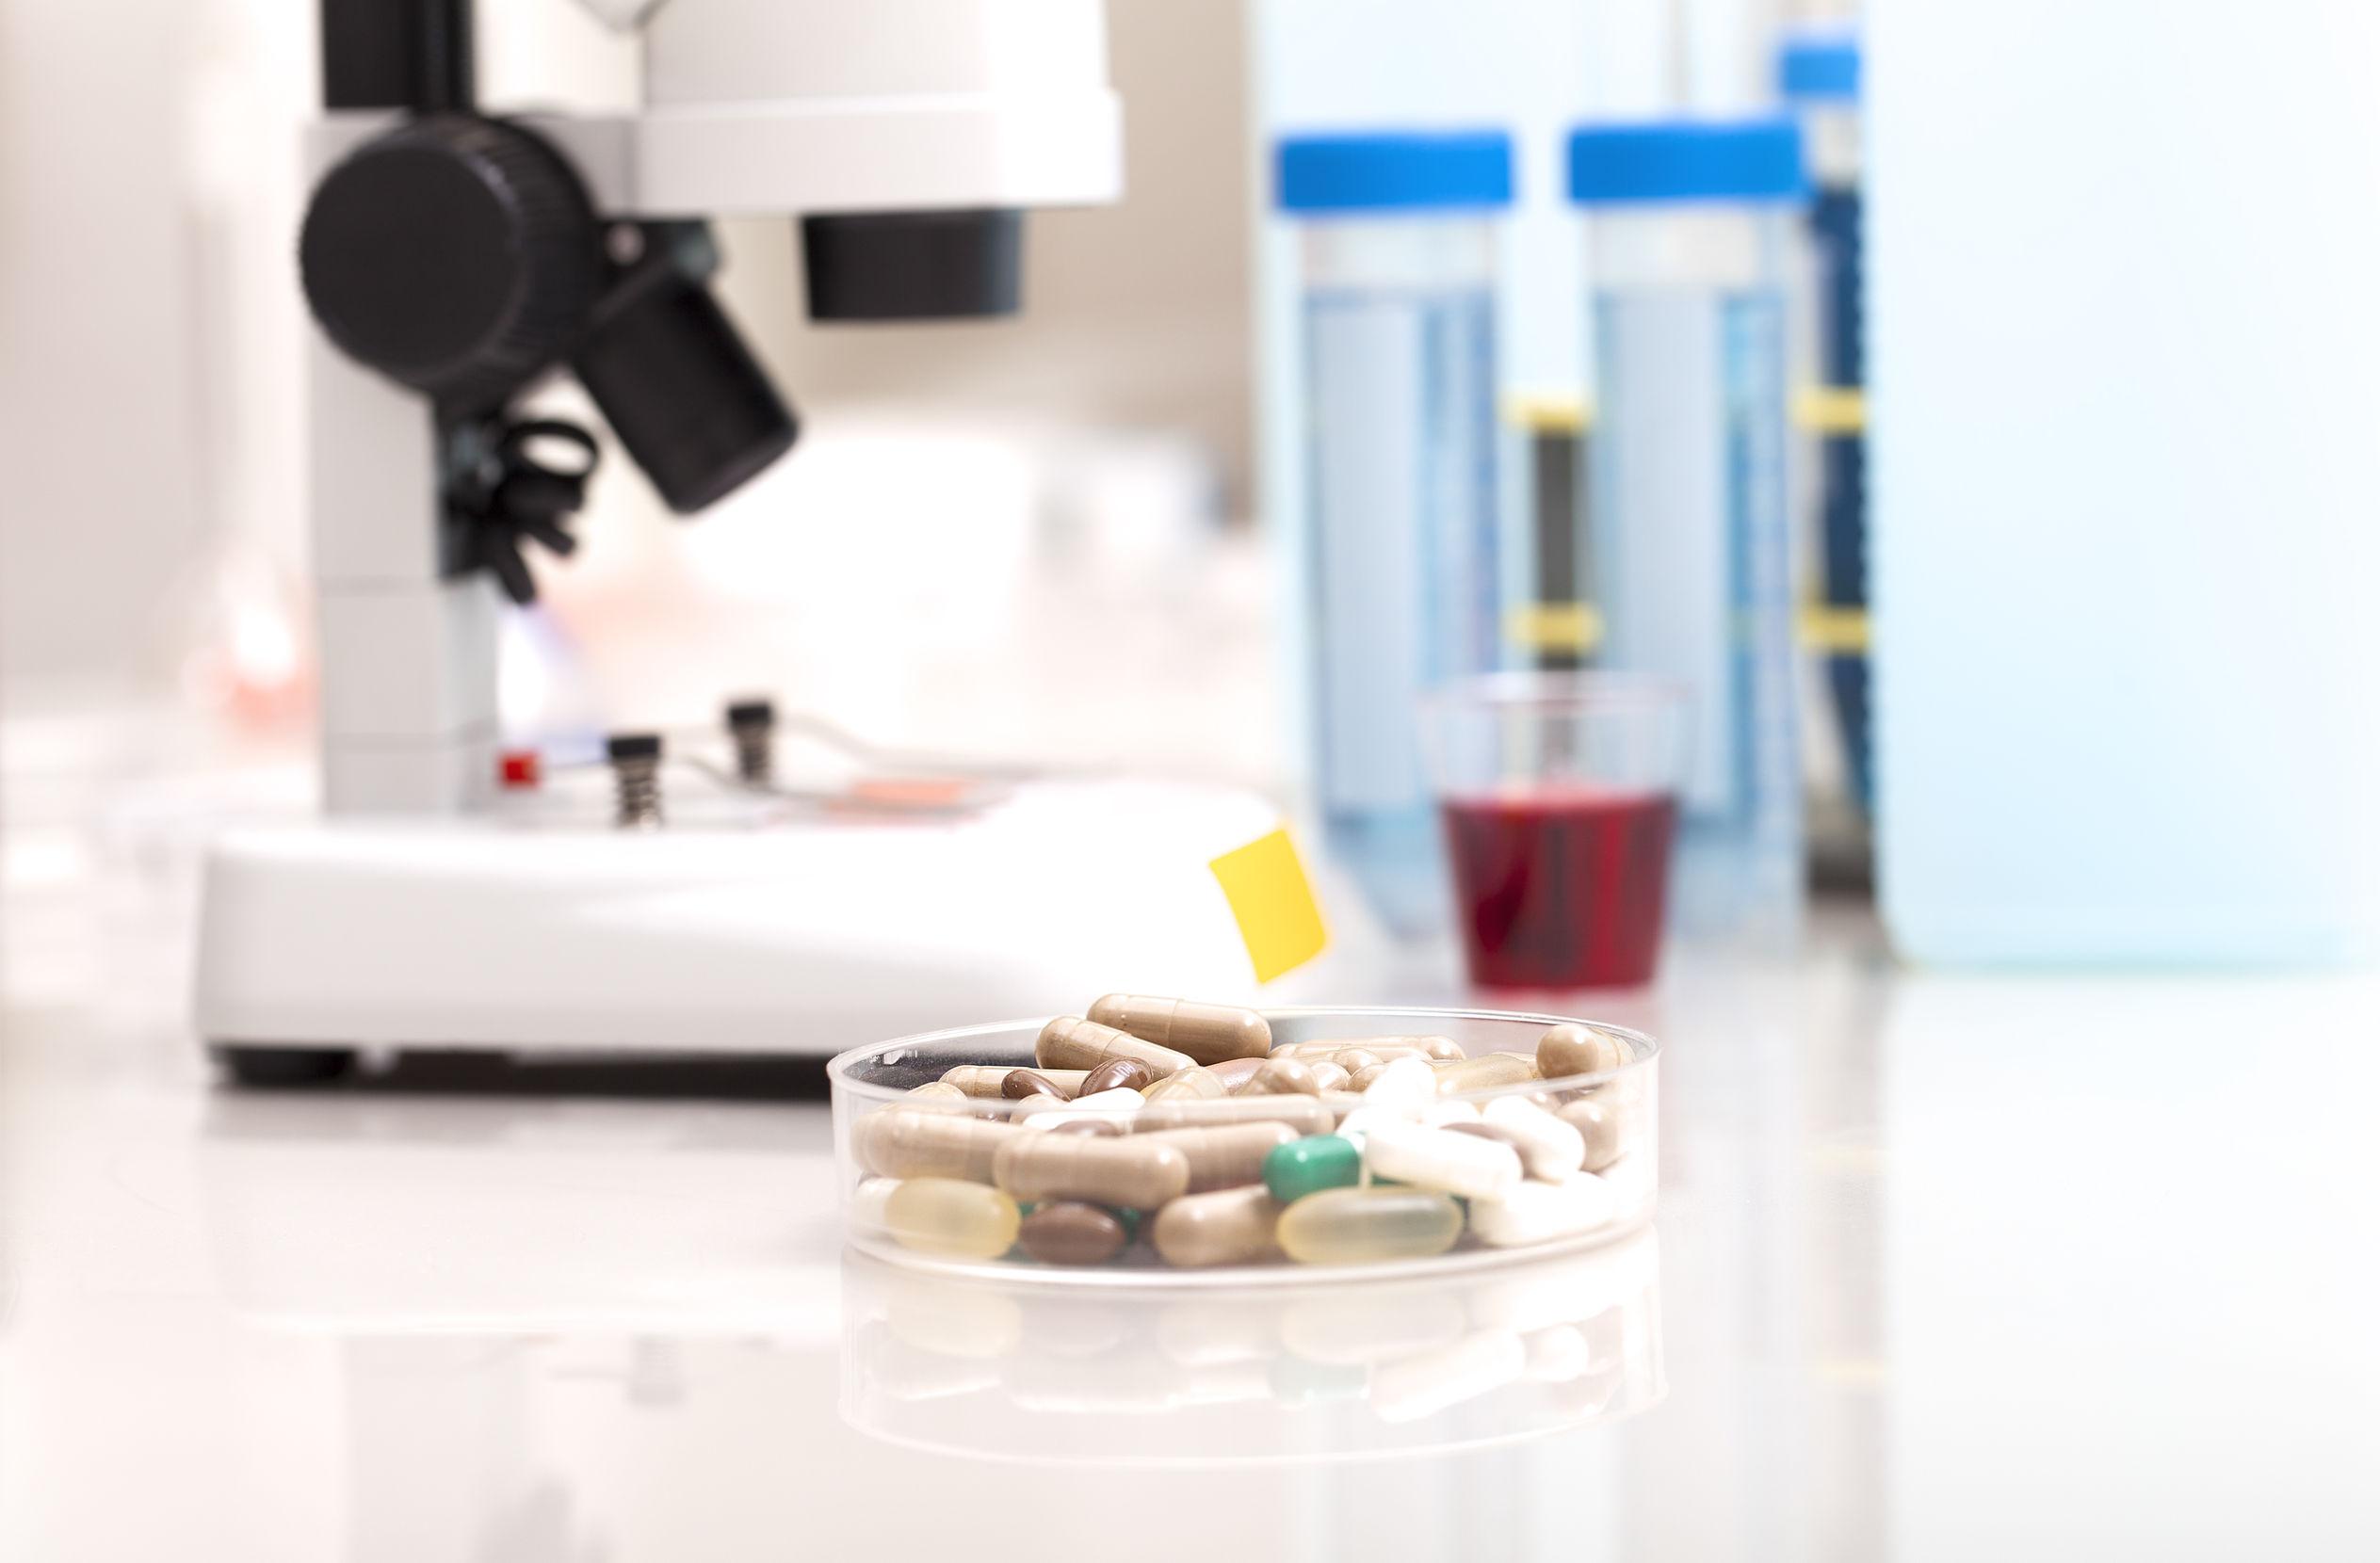 Immuno-Oncology Studies